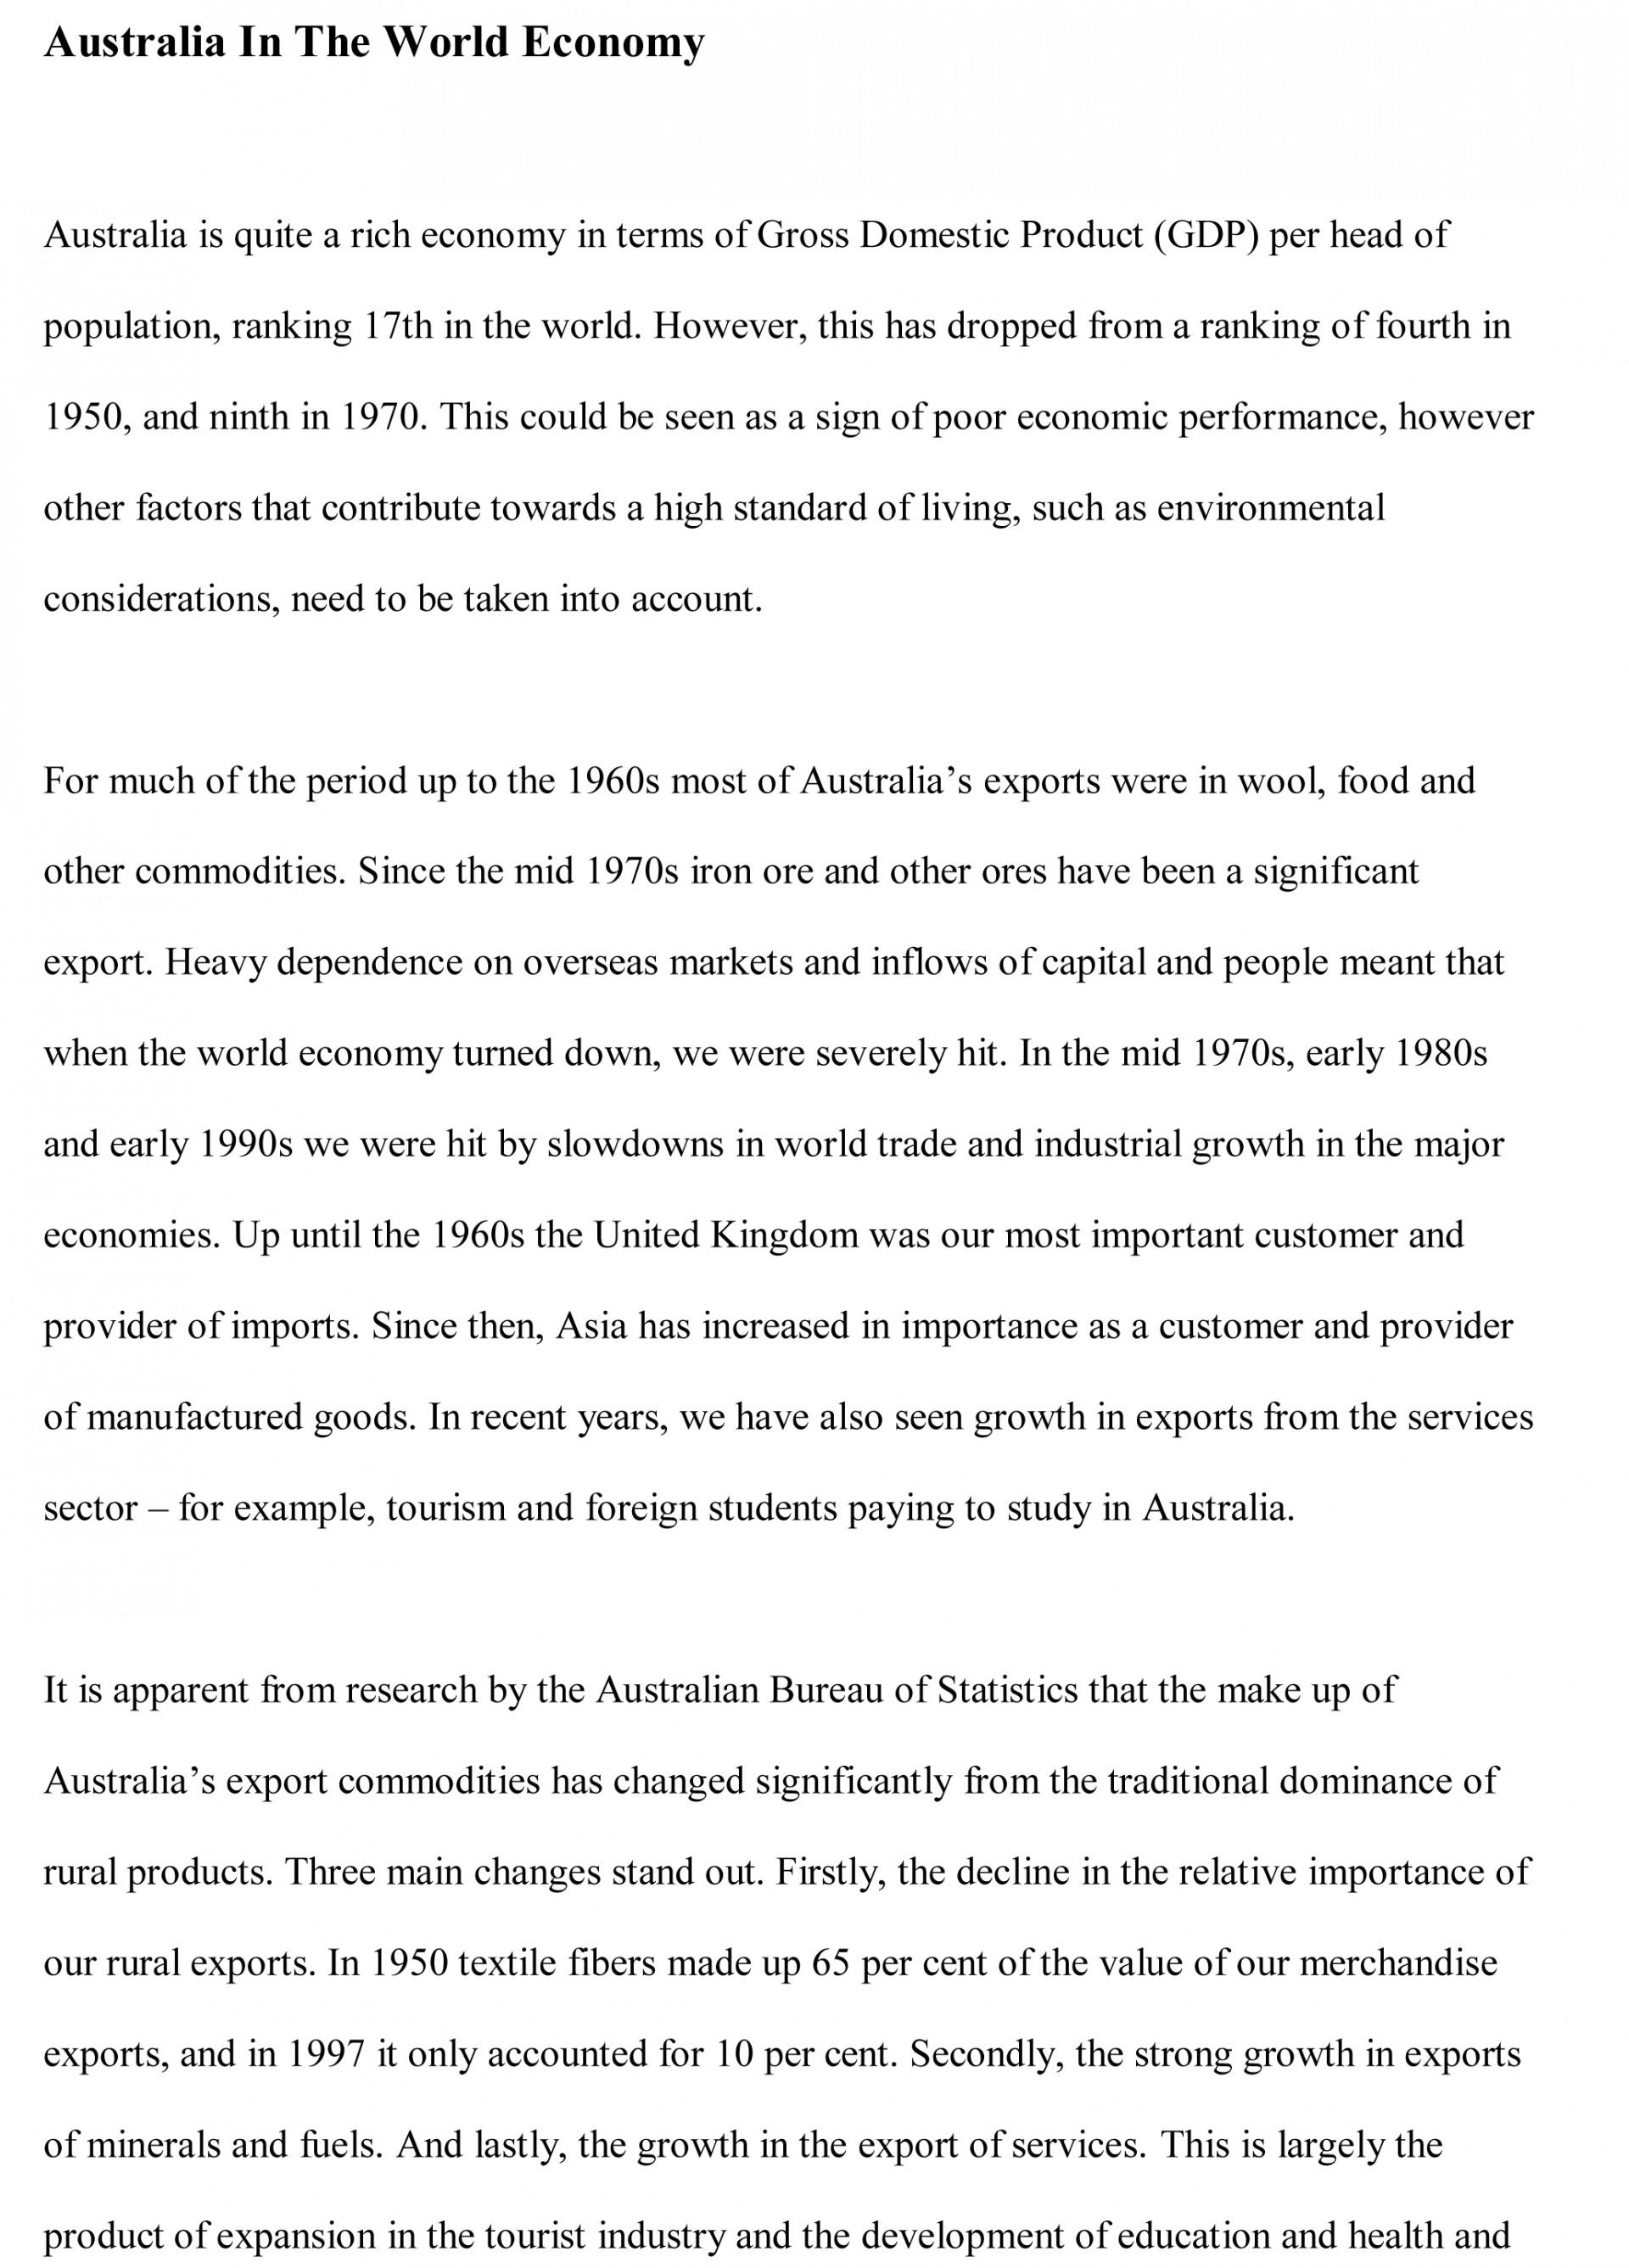 Singular 123 free essays thatsnotus